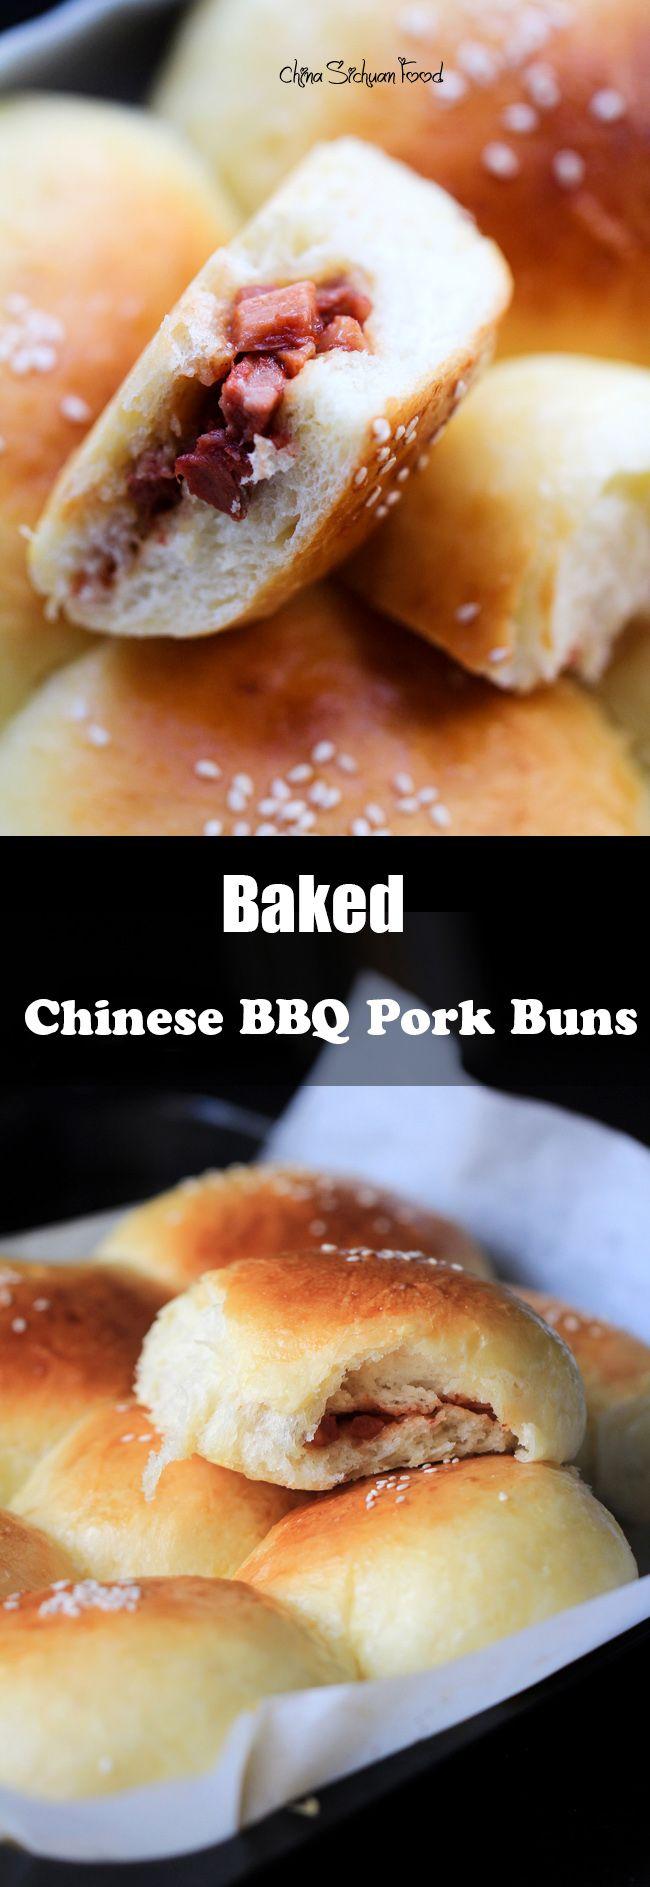 Baked Char Siu Bao---Chinese BBQ Pork Buns